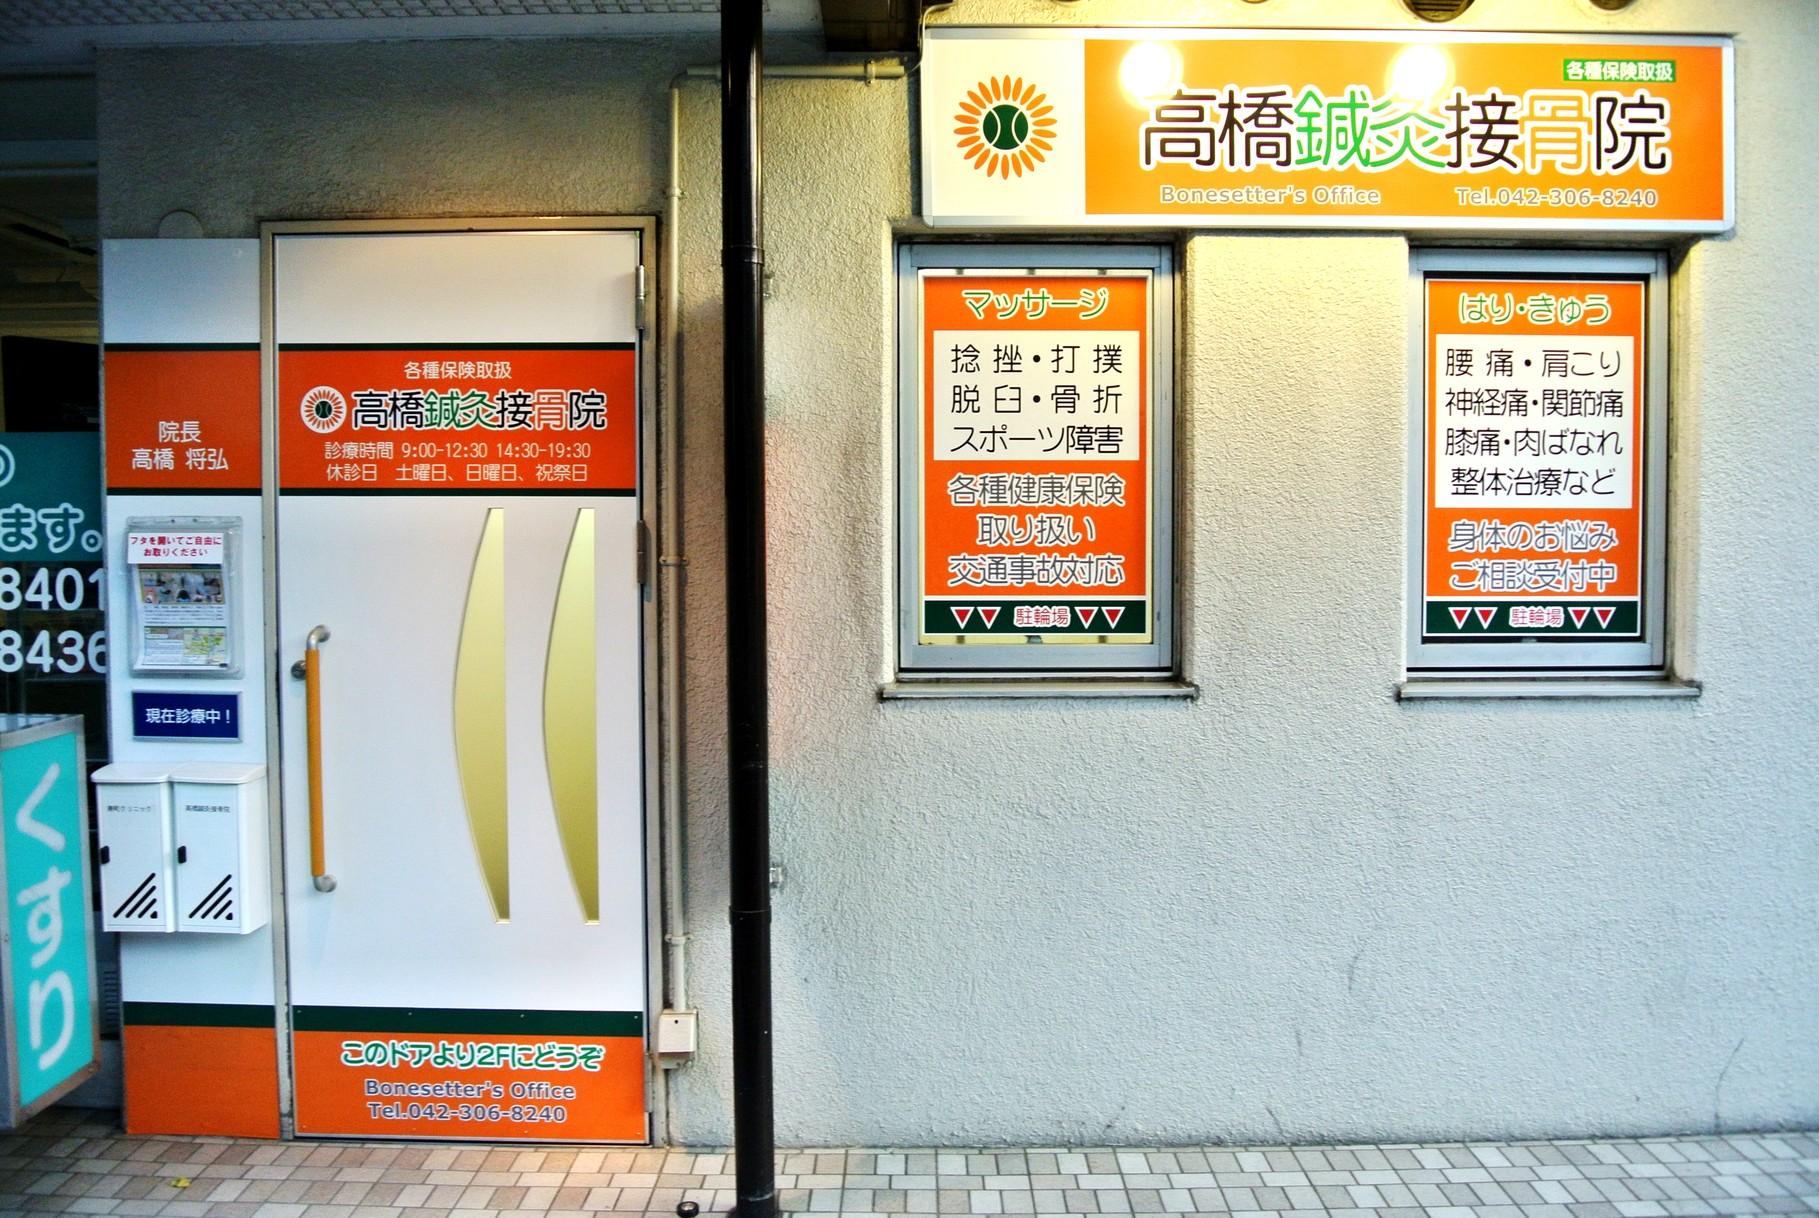 高橋鍼灸接骨院入り口(甲州街道沿い)